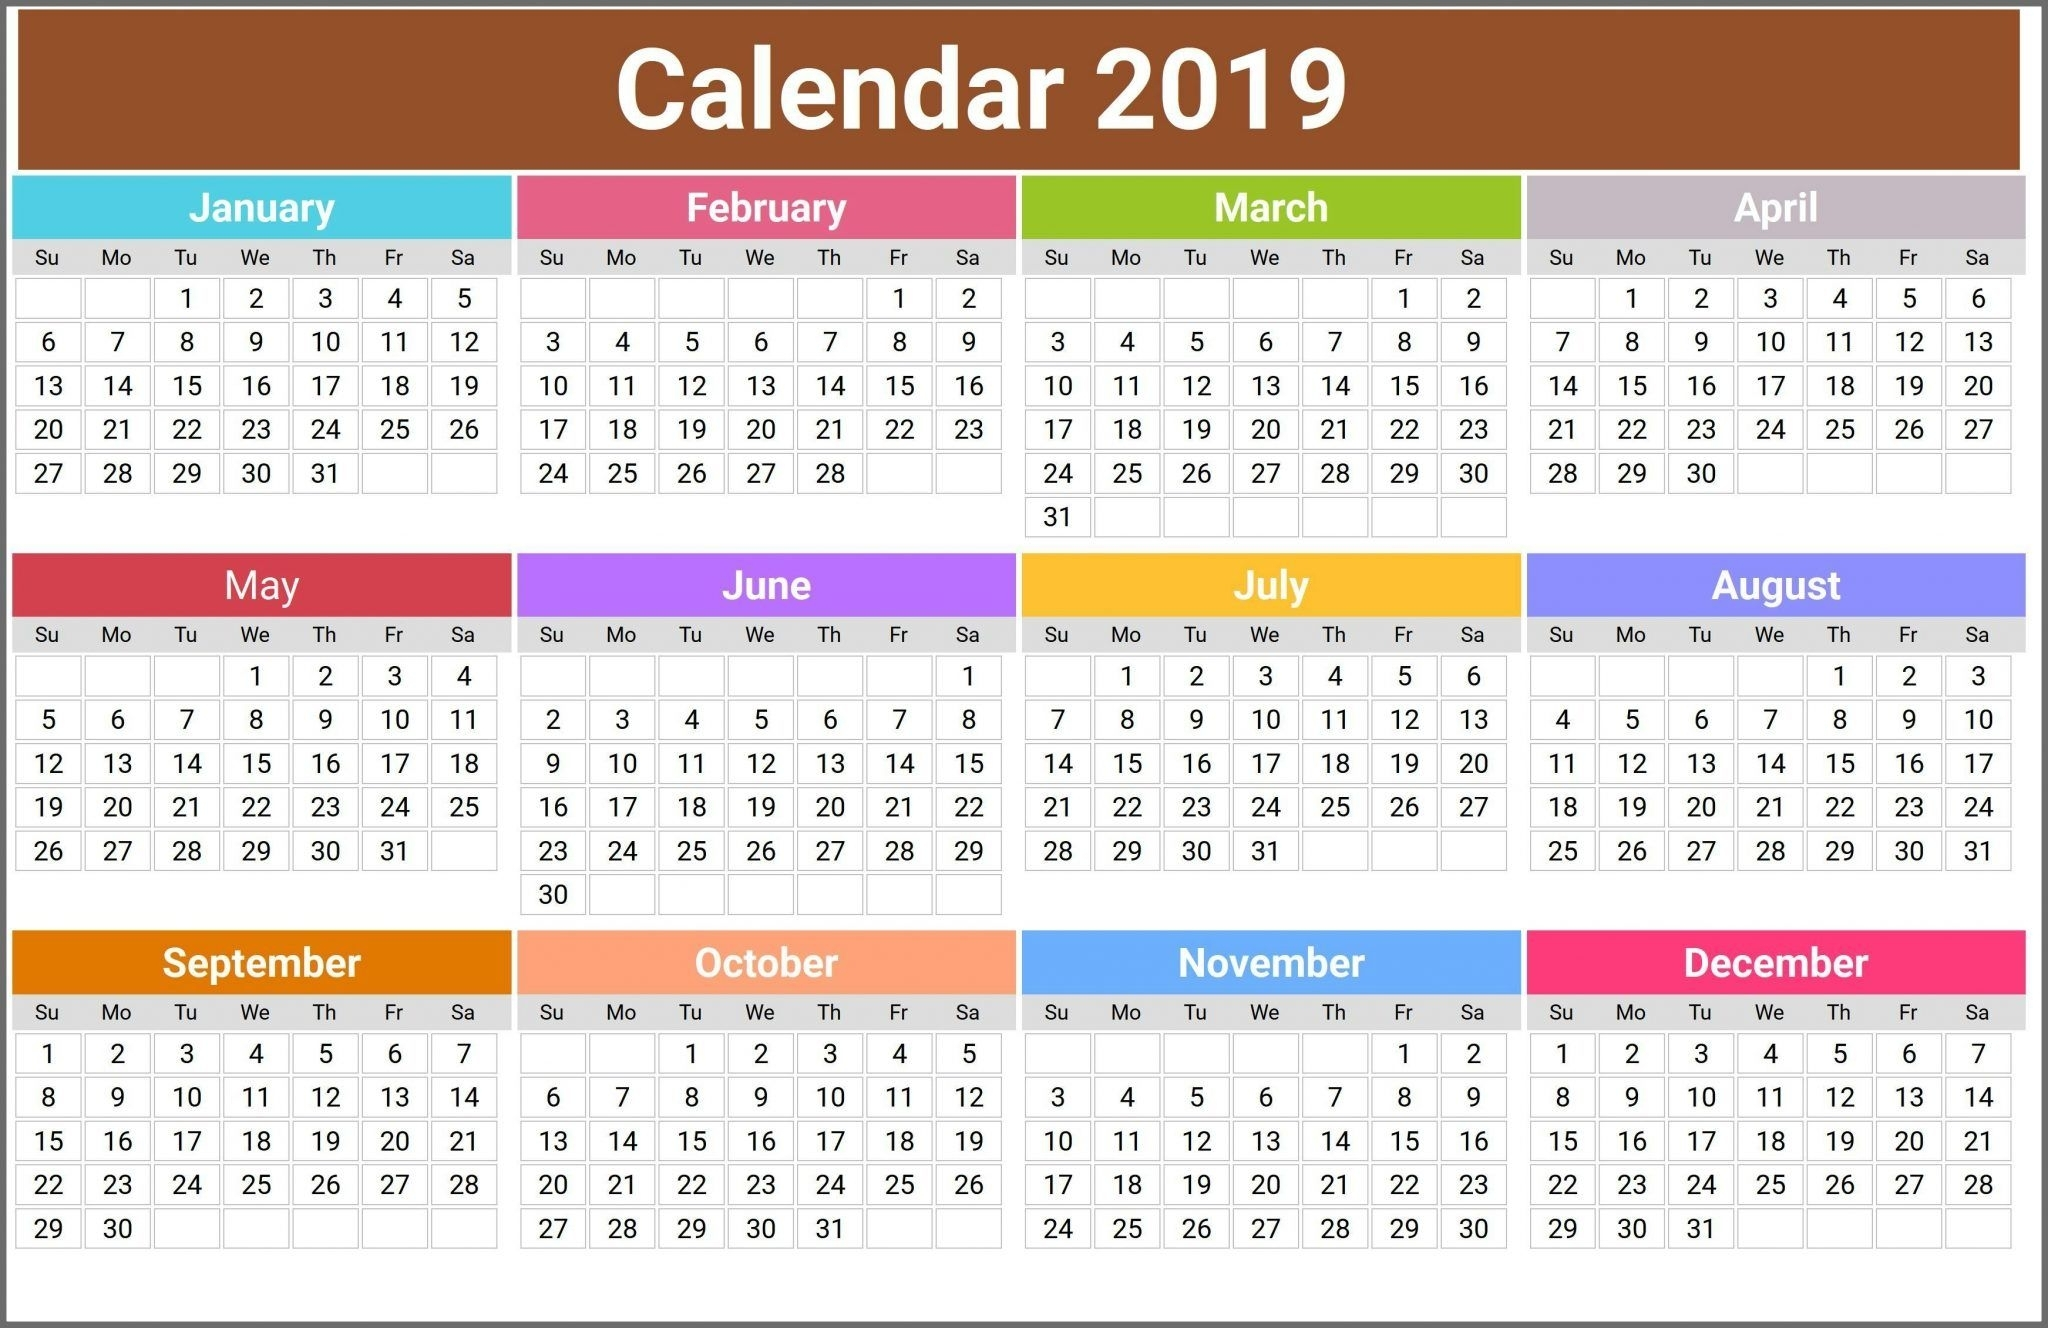 011 Month Calendar Template Amazing 12 Ideas Word One Page 2019 regarding 12 Month Calendar Picture Ideas